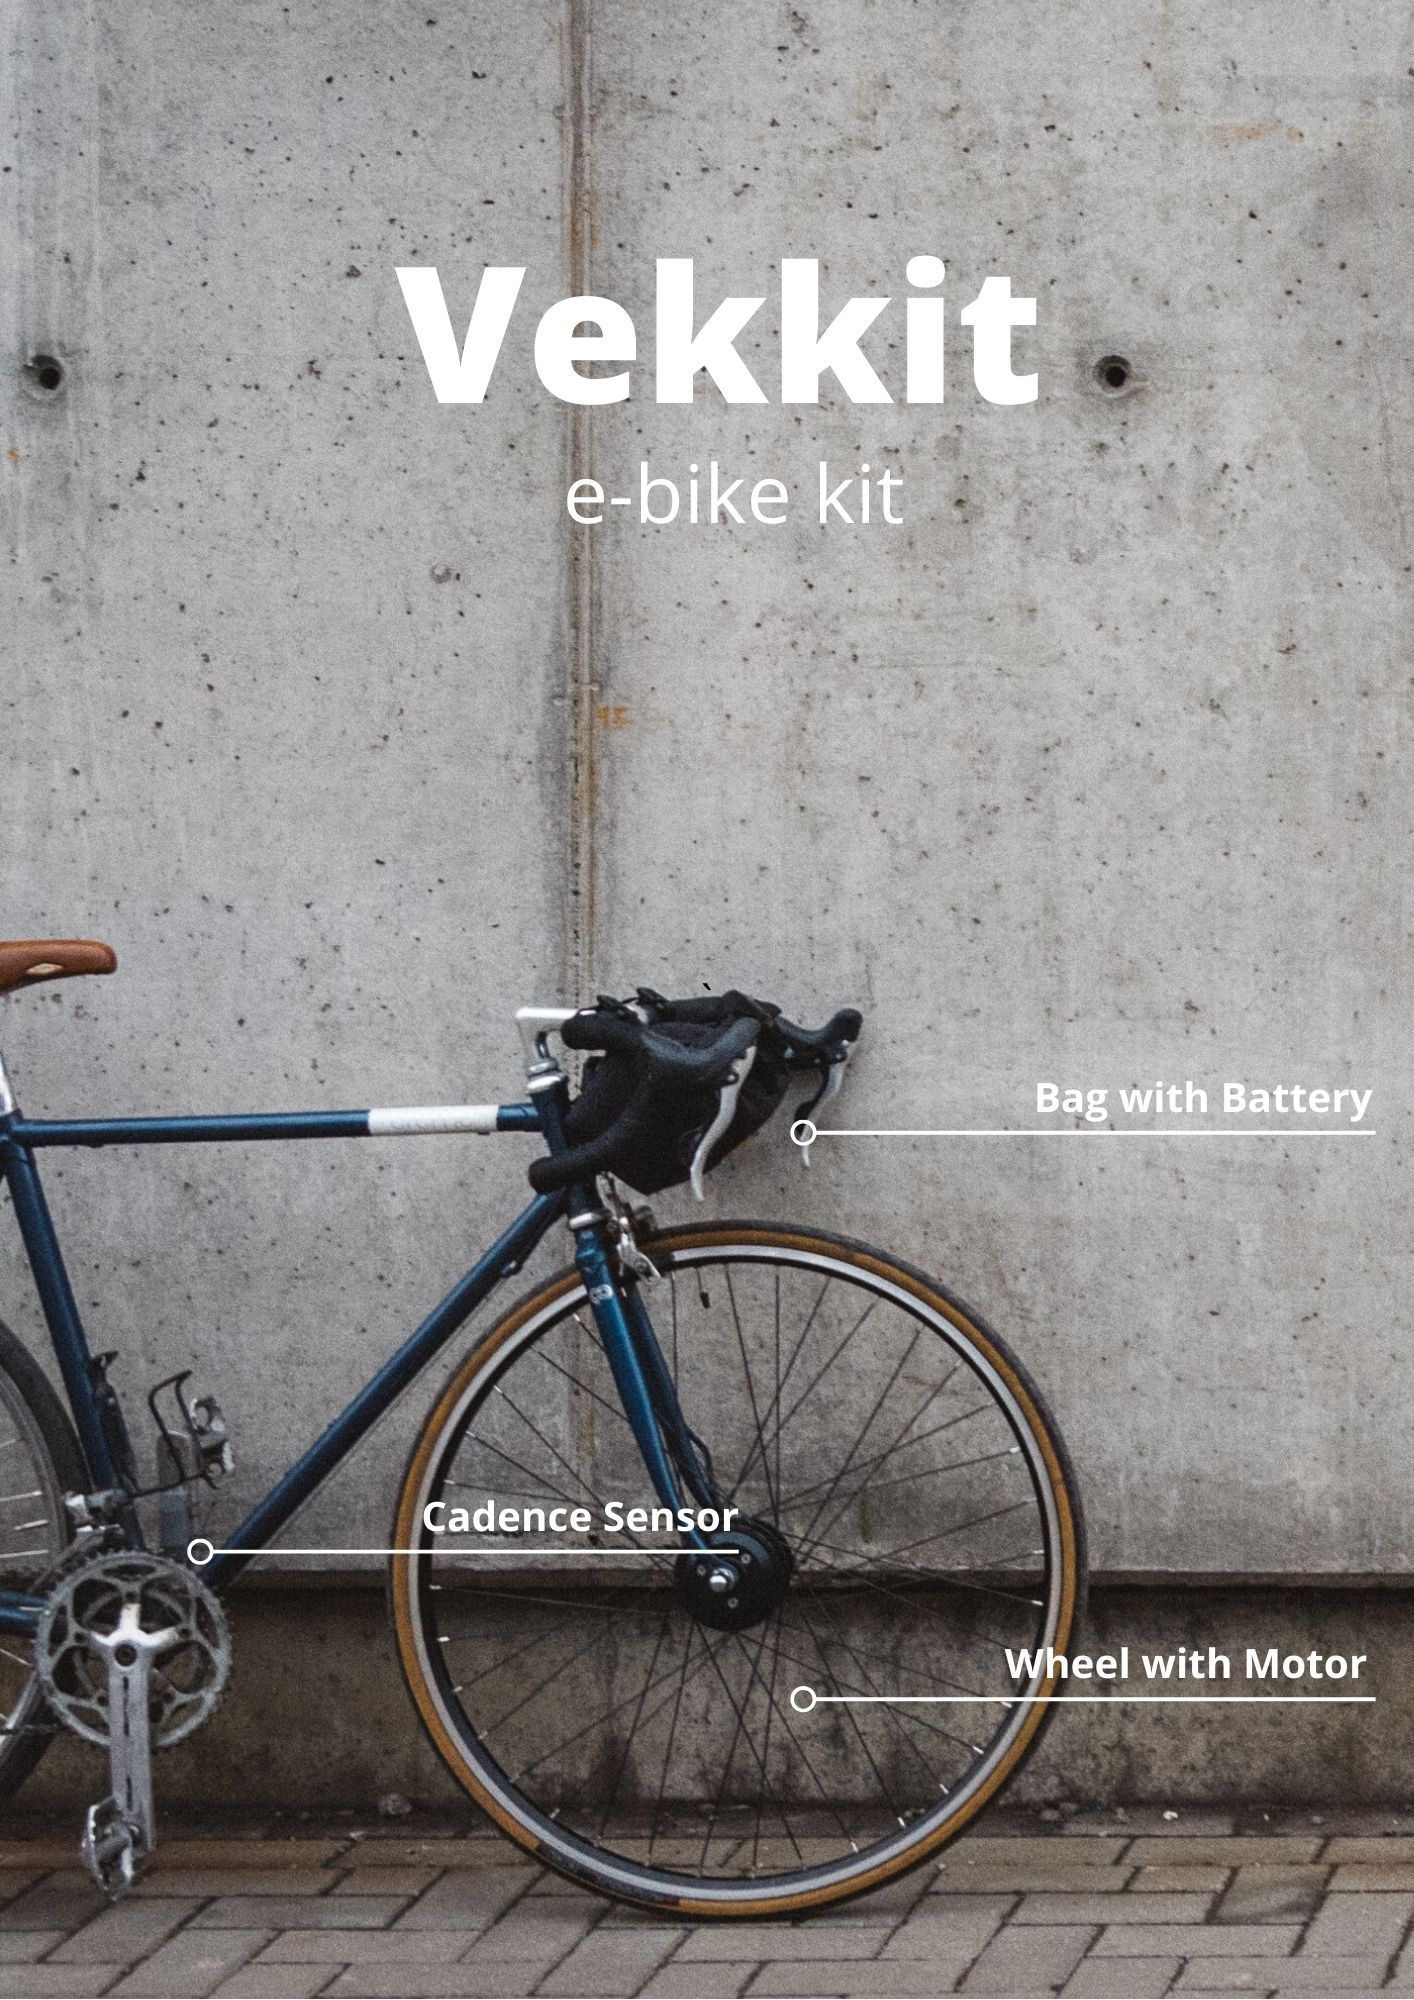 Vekkit Electric Bike Conversion Kit E Bike Kit Bike Bike Bag